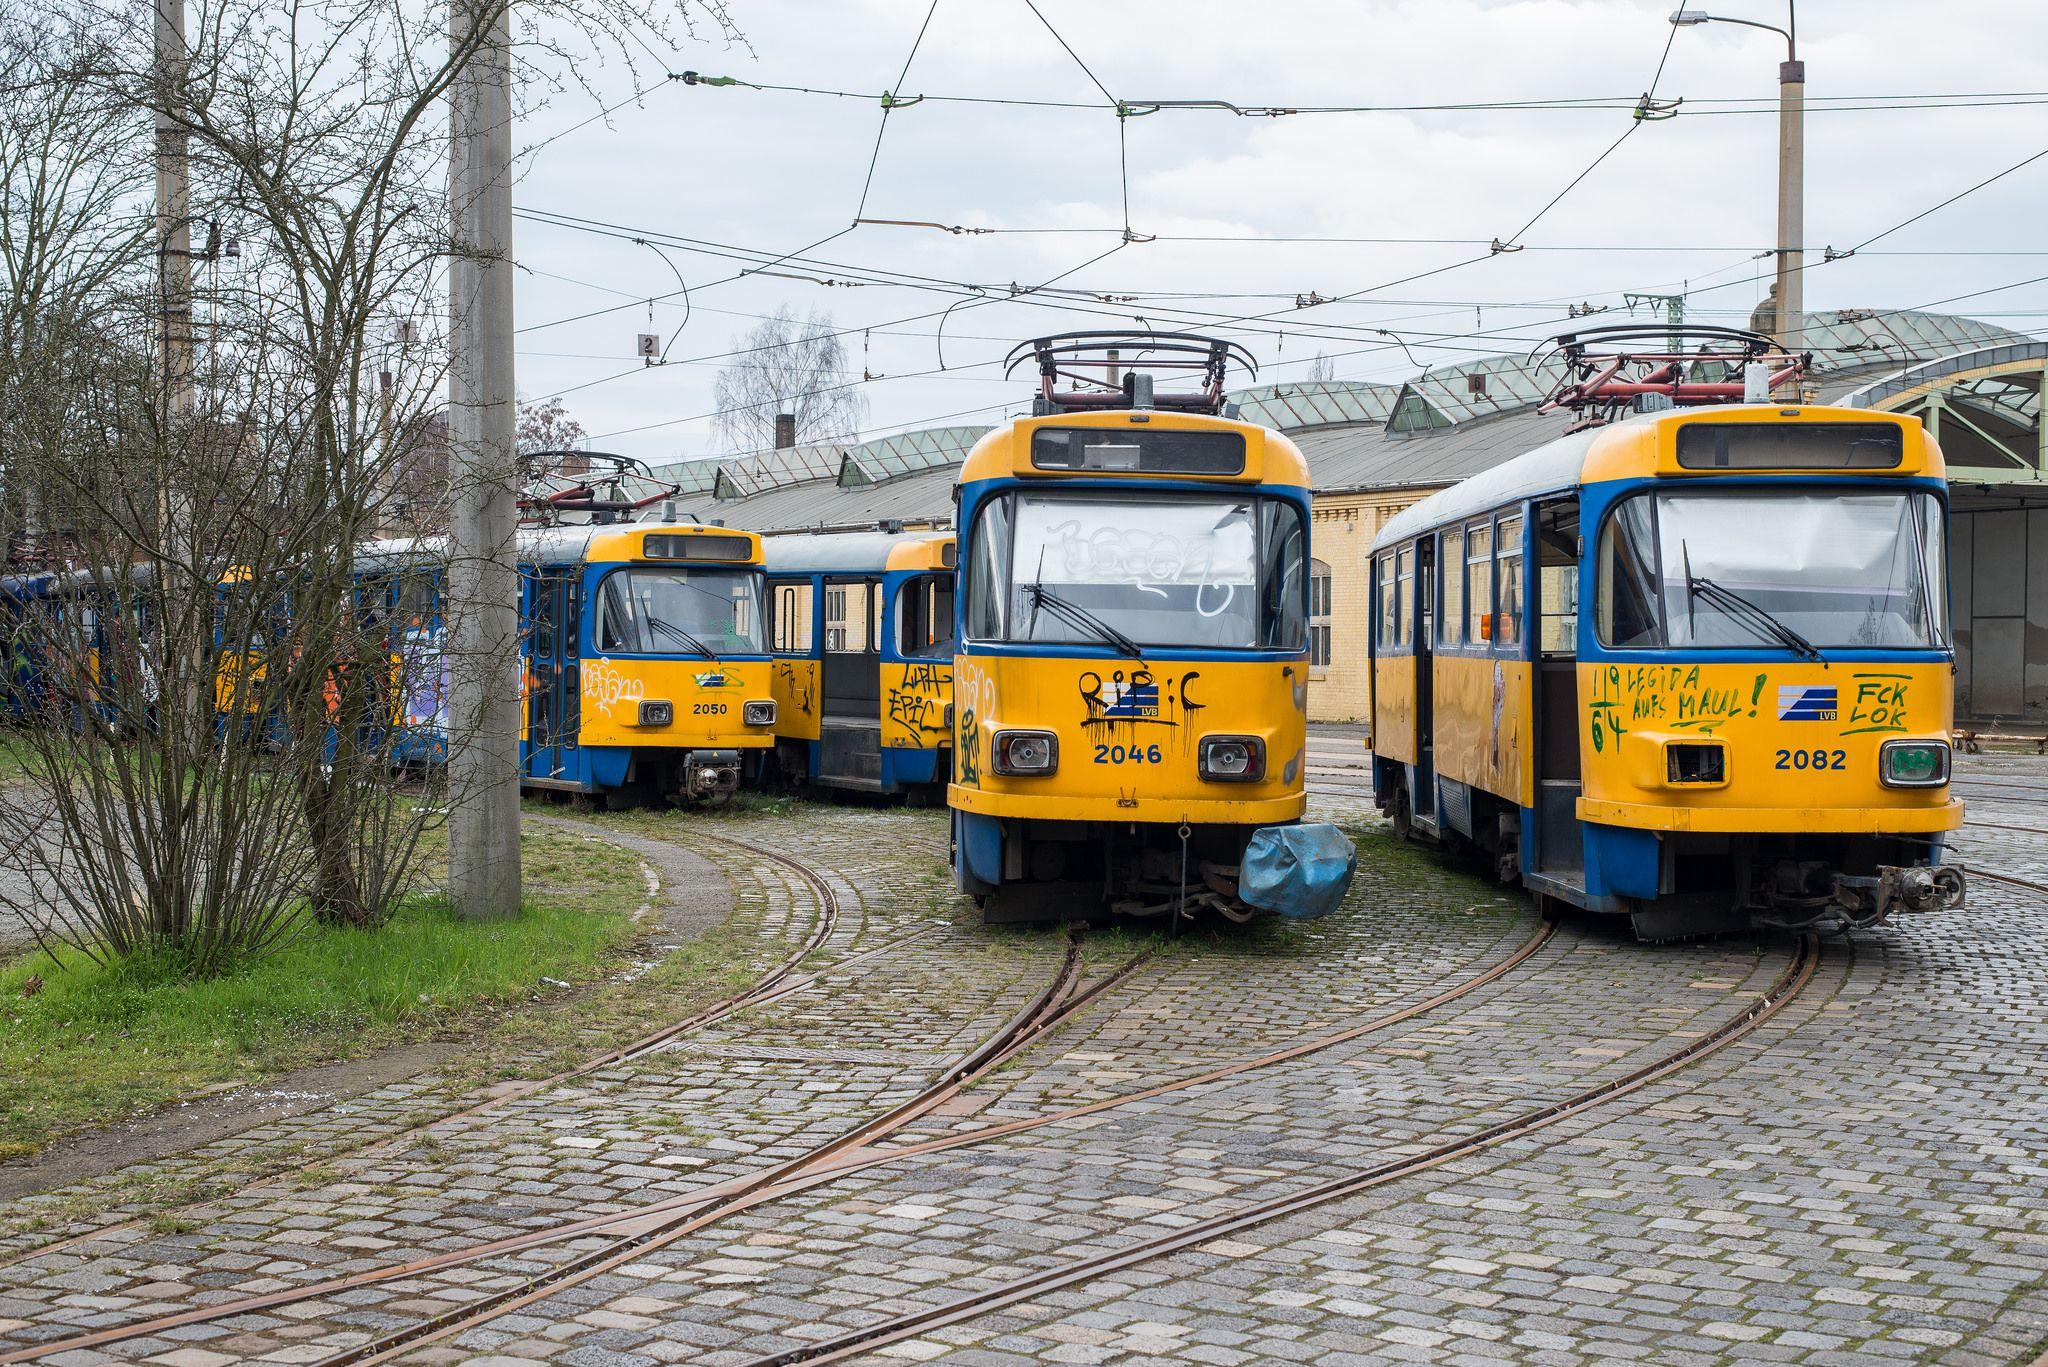 Lvb Straßenbahn